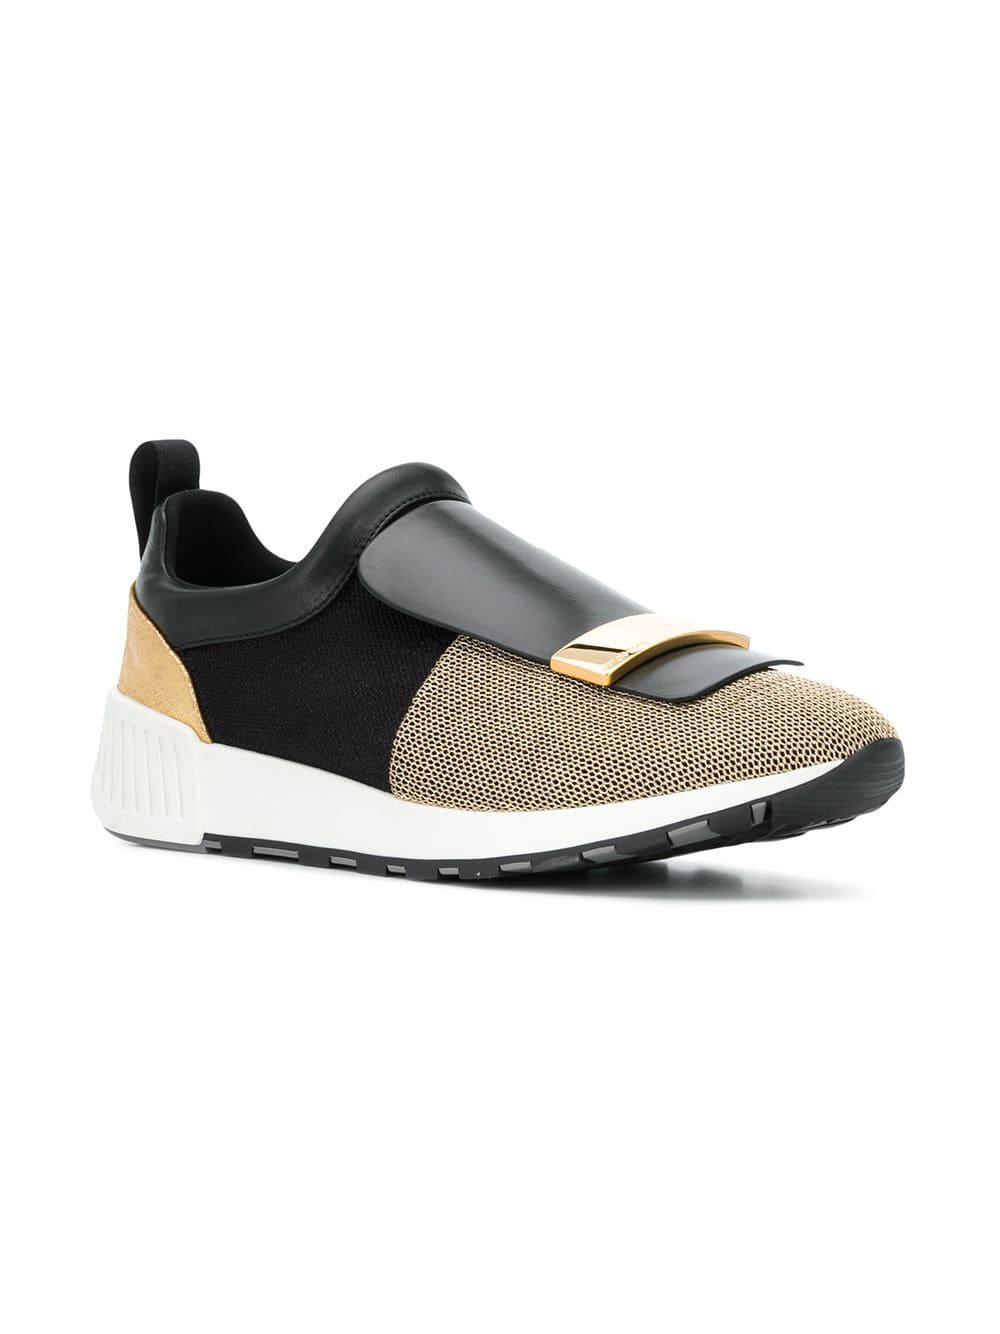 new concept b1e8d 07a16 sergio-rossi-Metallic-Sr1-Running-Sneakers.jpeg